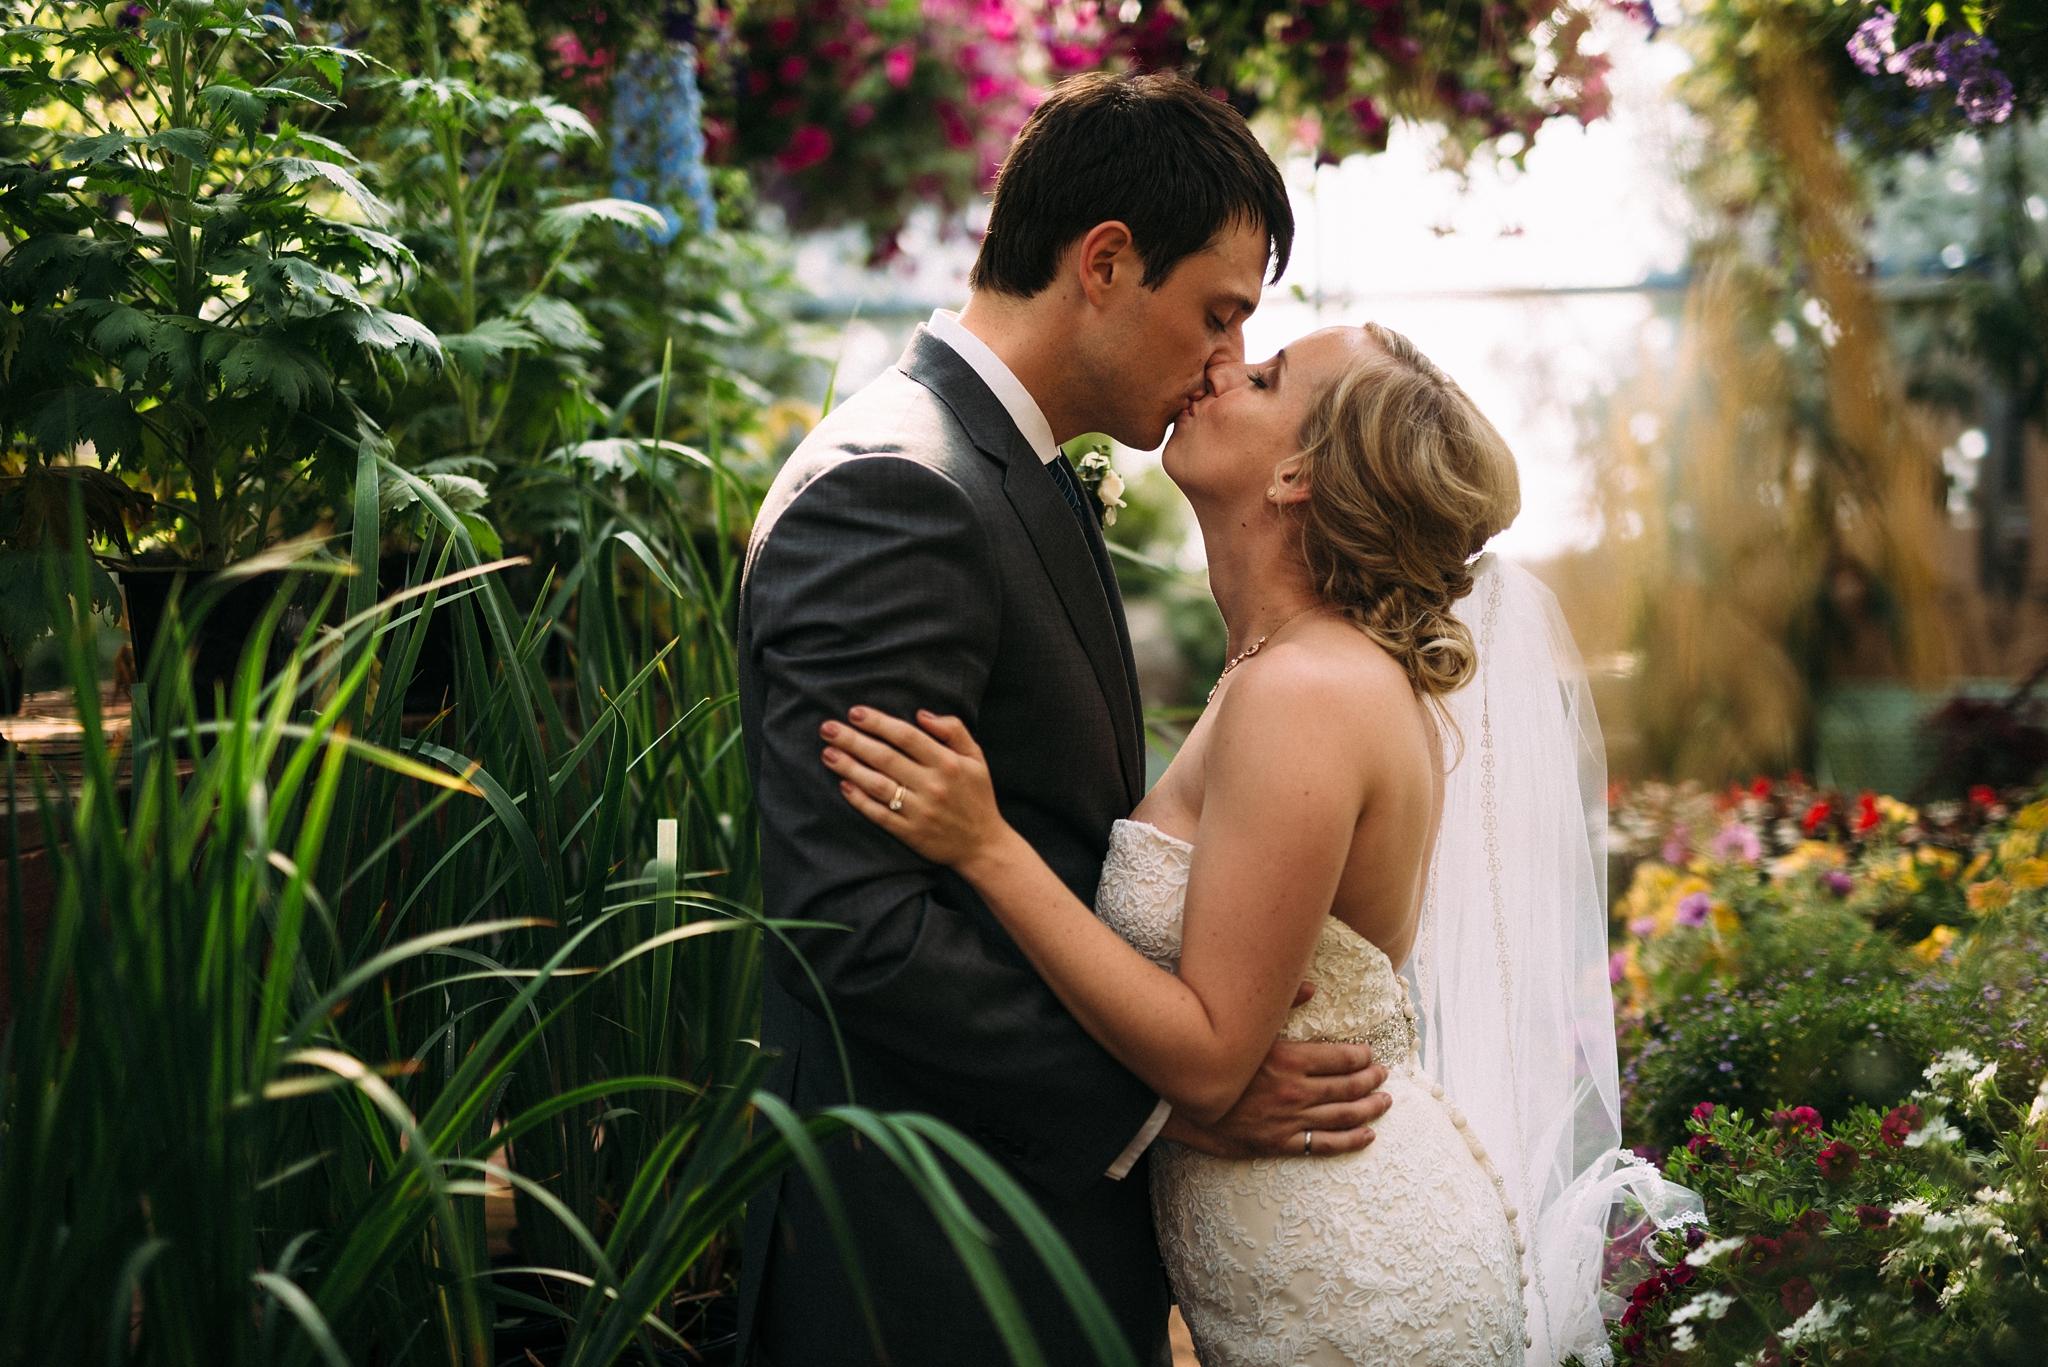 kaihla_tonai_intimate_wedding_elopement_photographer_4341